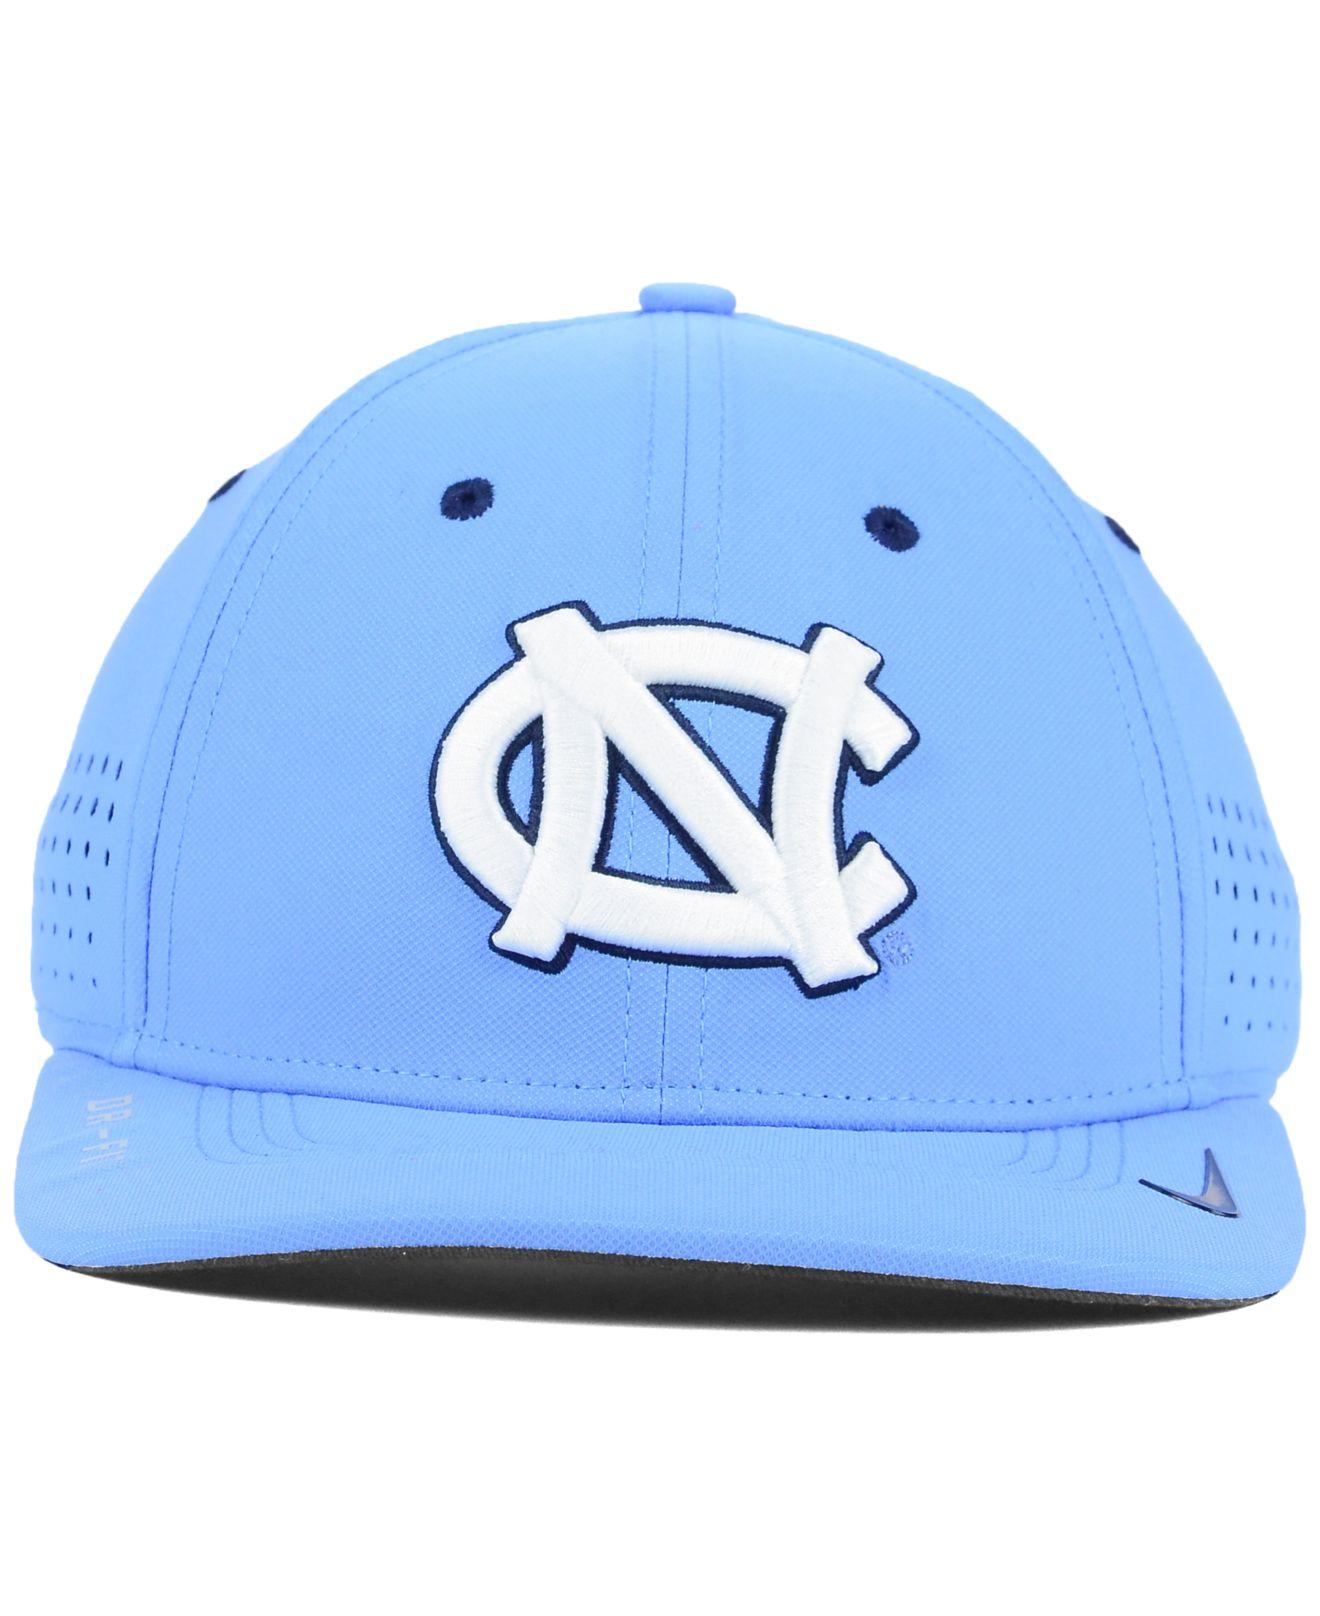 online store 17d79 d22bc ... reduced lyst nike north carolina tar heels sideline cap in blue for men  3b89d 5e341